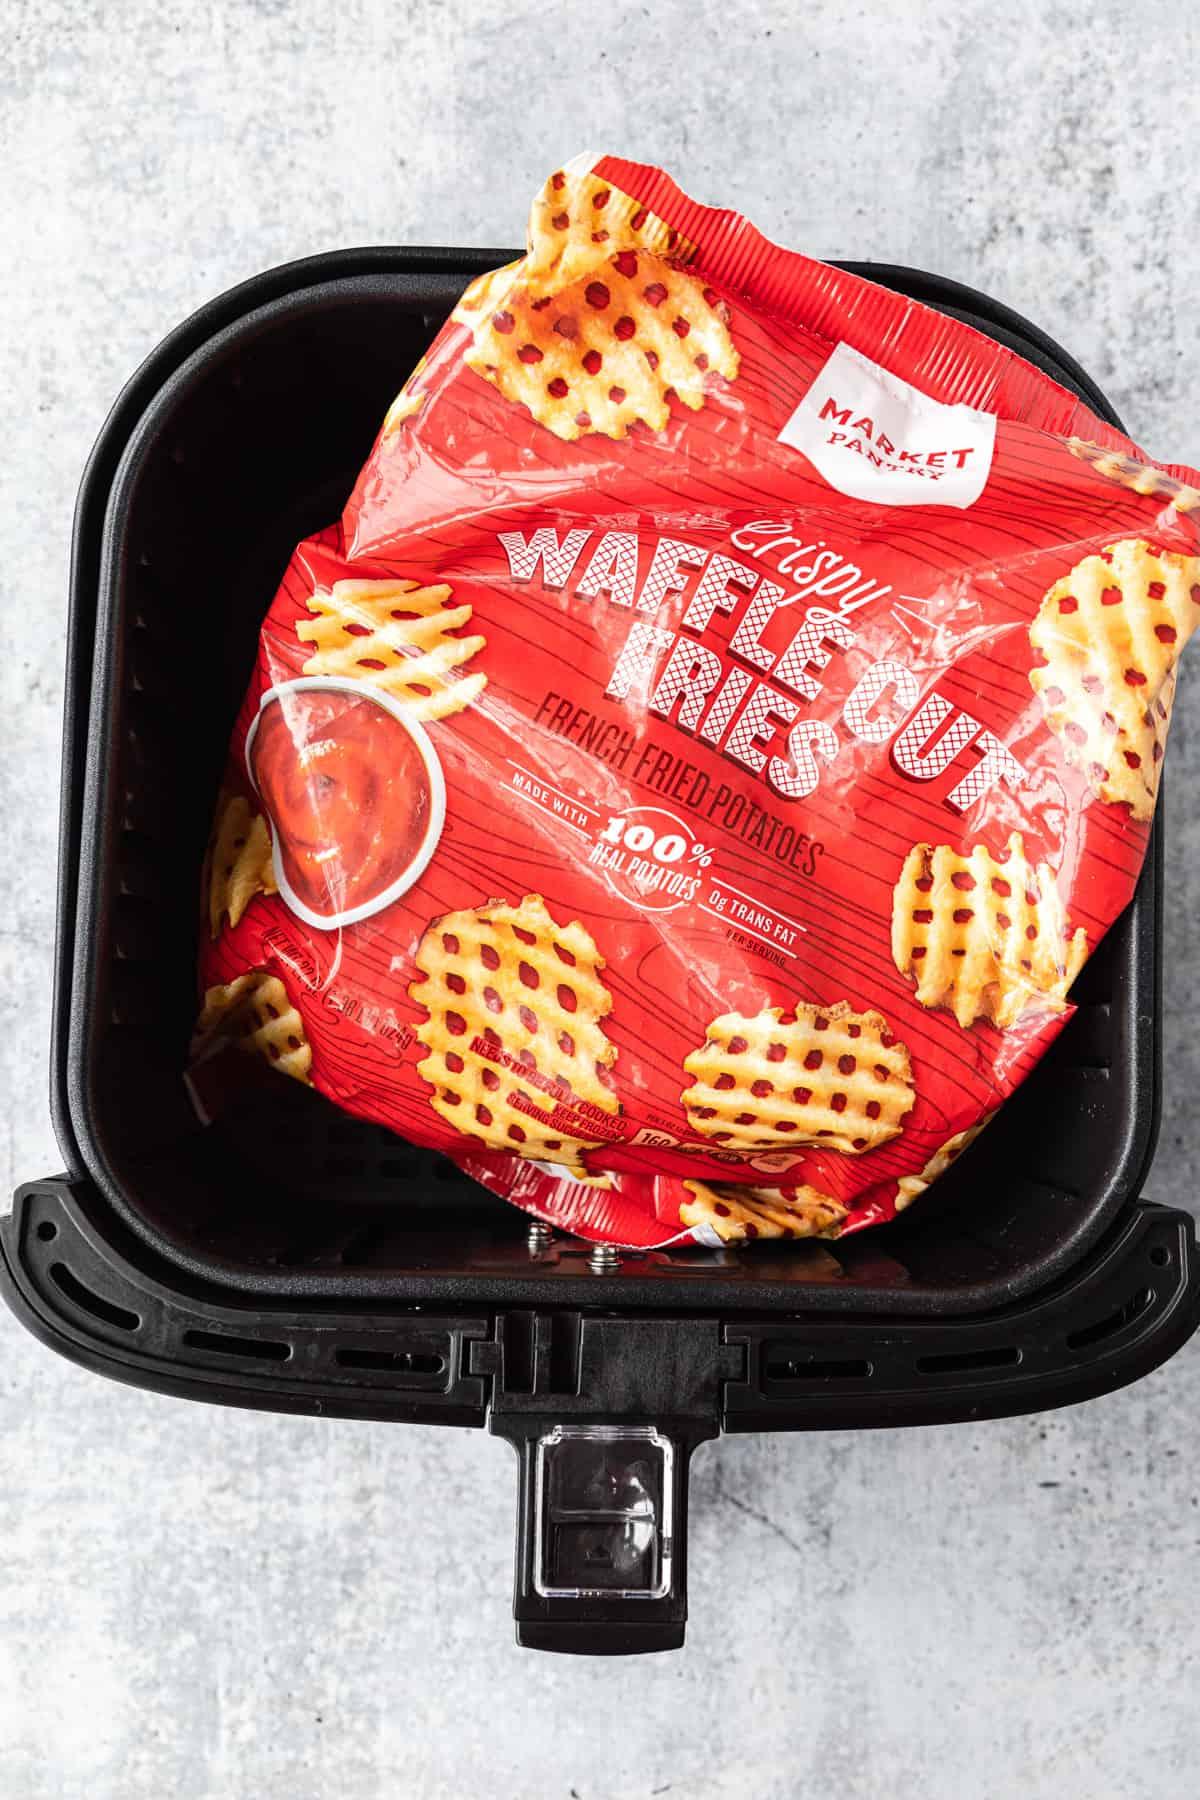 a bag of frozen waffle fries in an air fryer basket